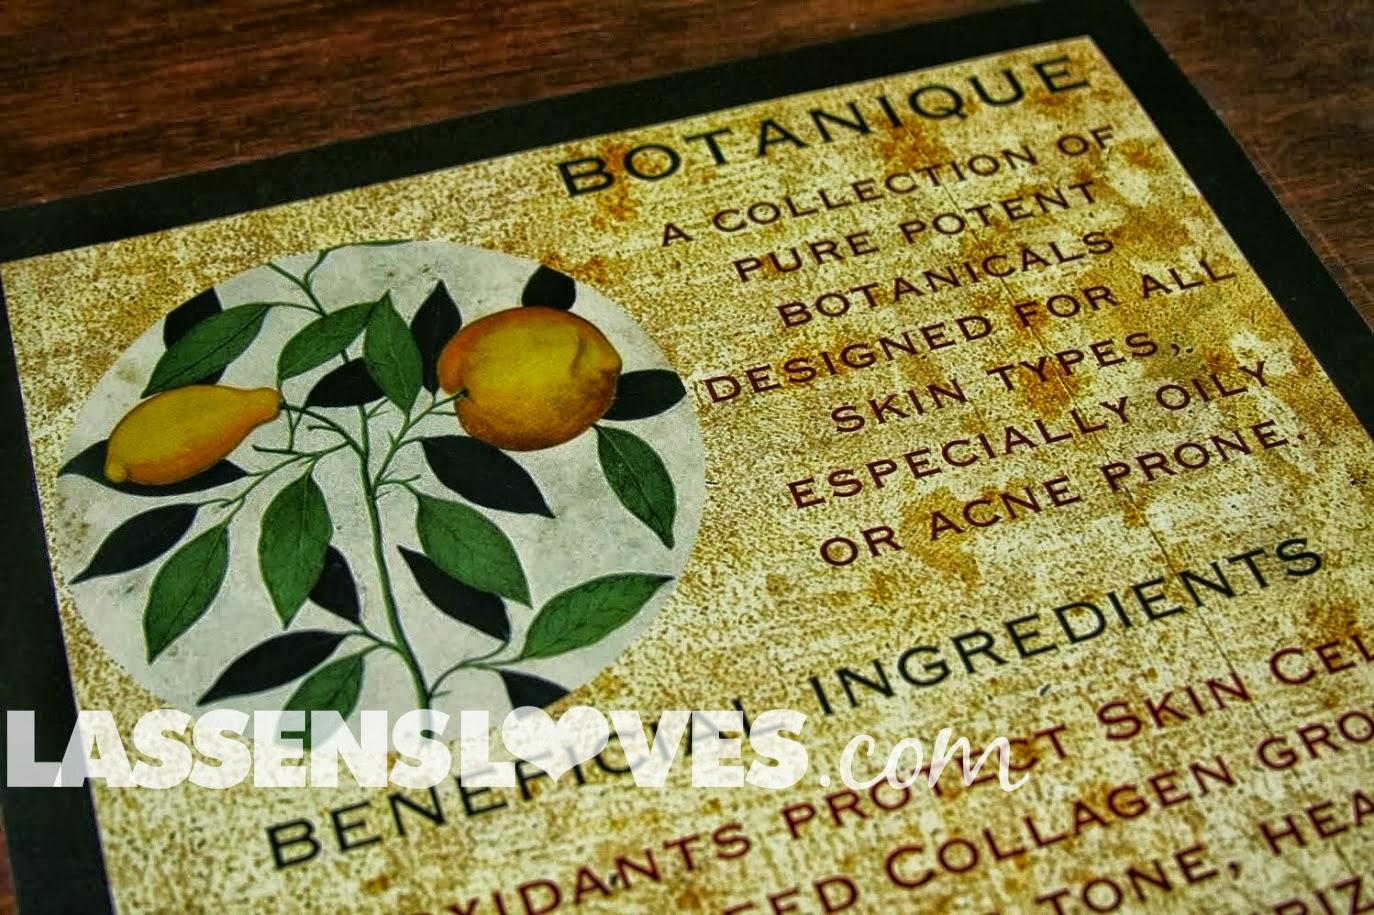 lassensloves.com, Lassen's, Metamour+botanique, skin+care, sensitive+skin,